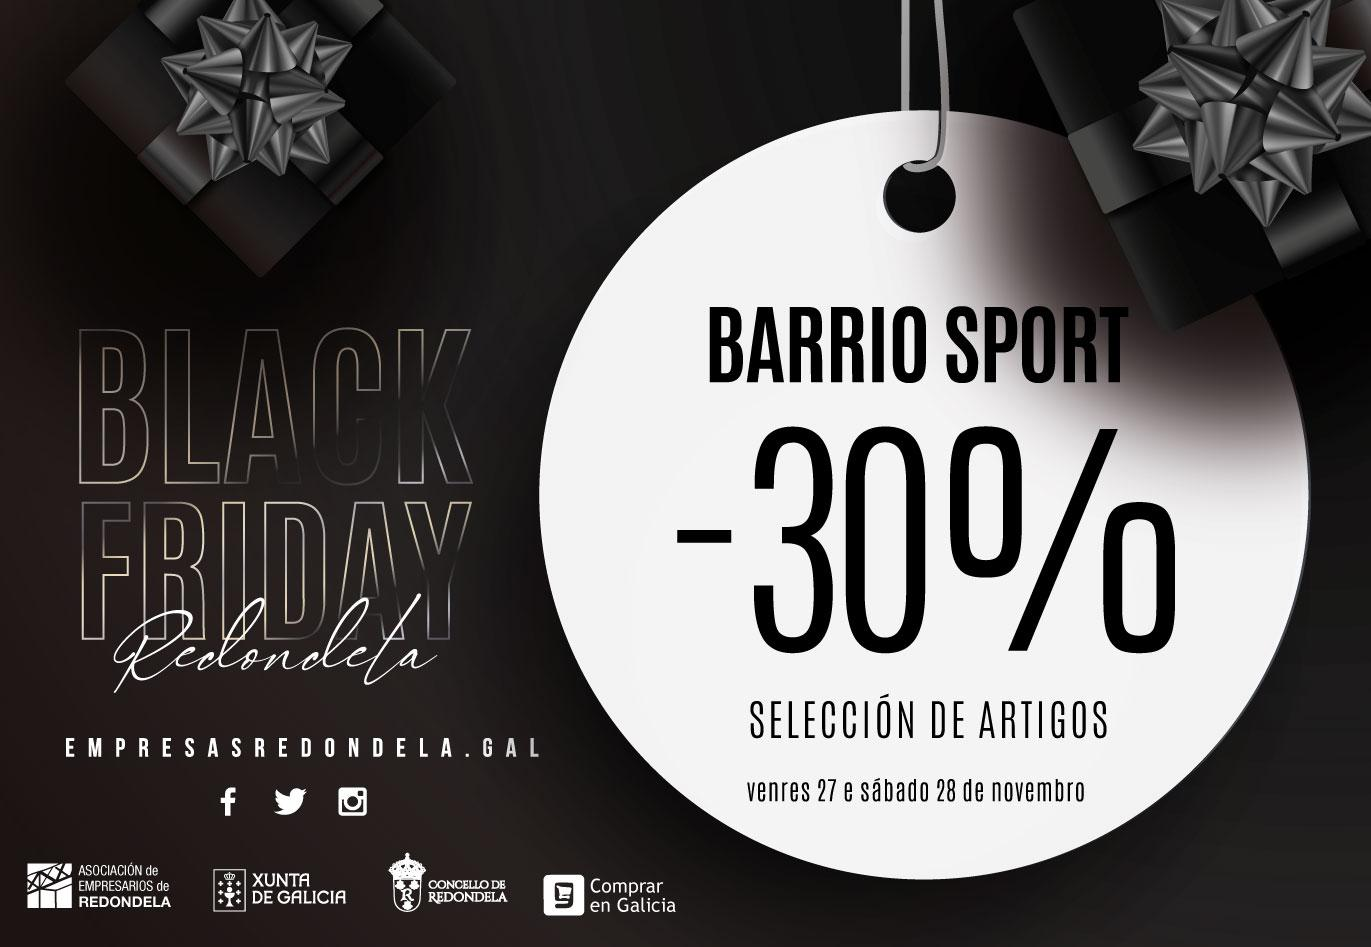 BARRIO-SPORT.jpg